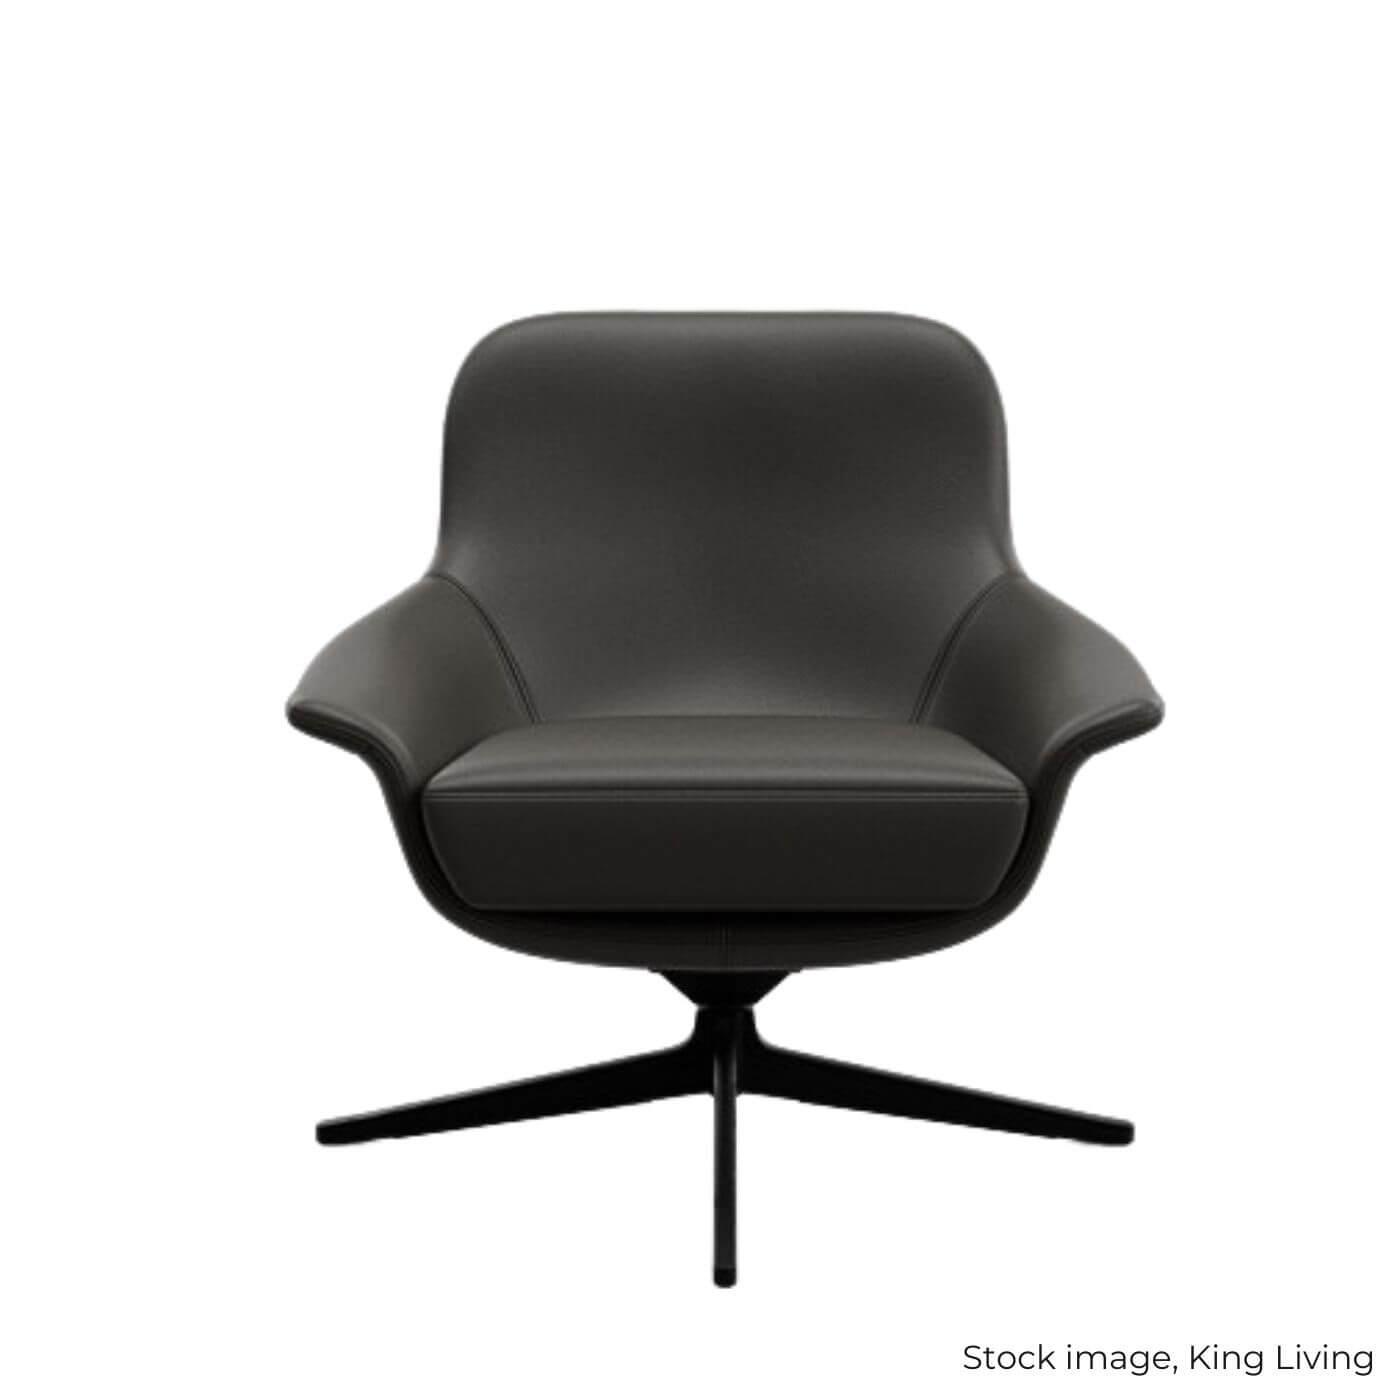 King Living Seymour black leather swivel chair